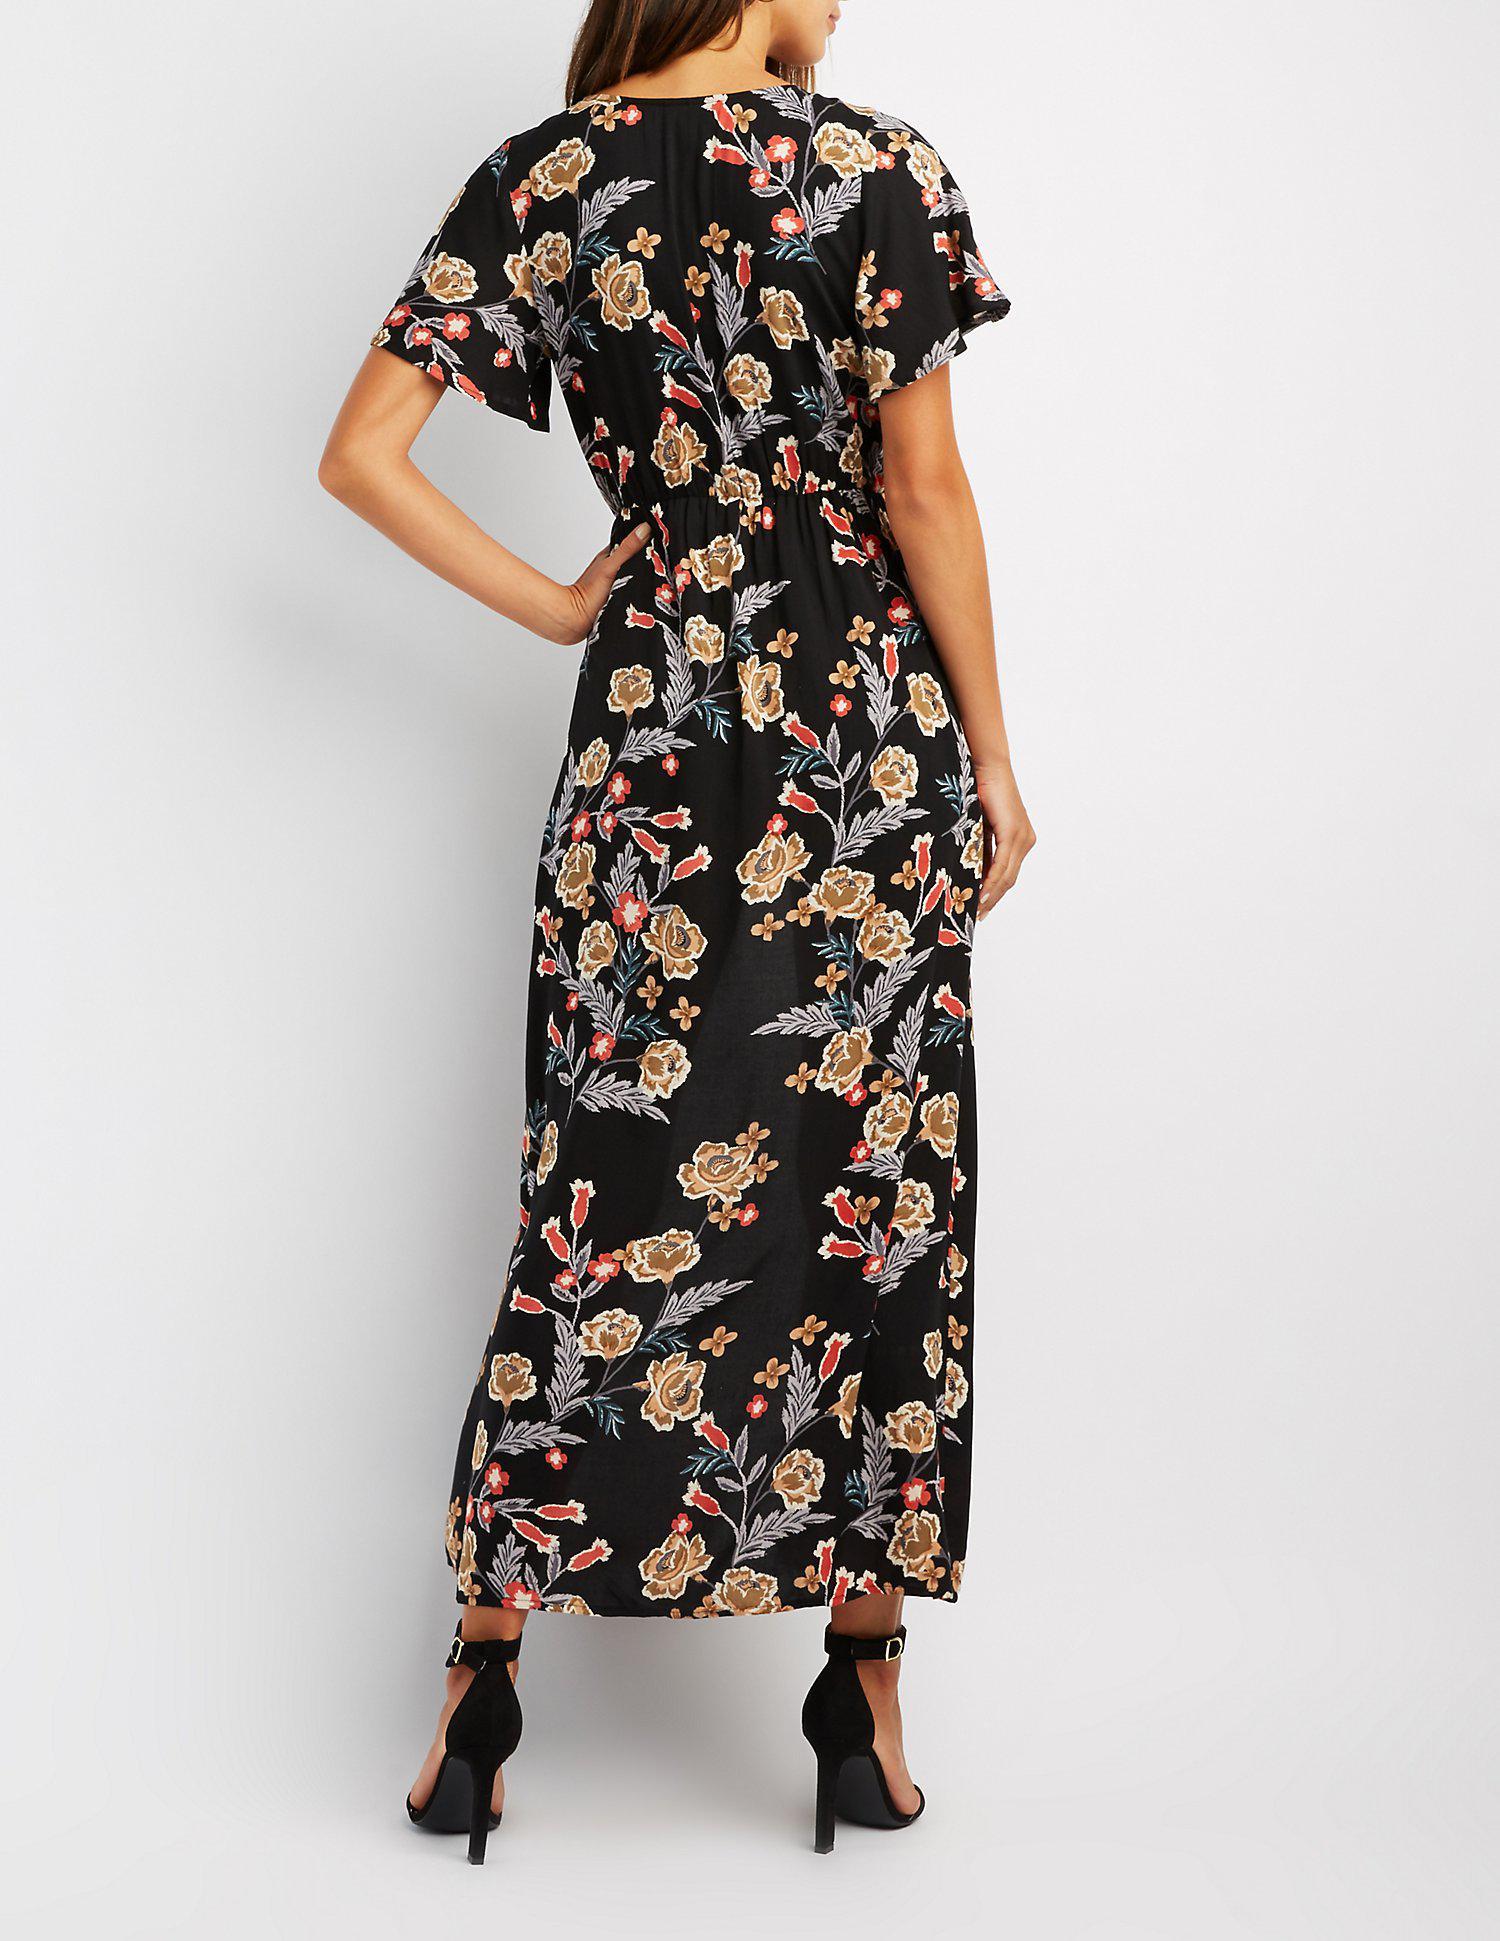 4a1c29ec036 Lyst - Charlotte Russe Floral Surplice Maxi Romper in Black